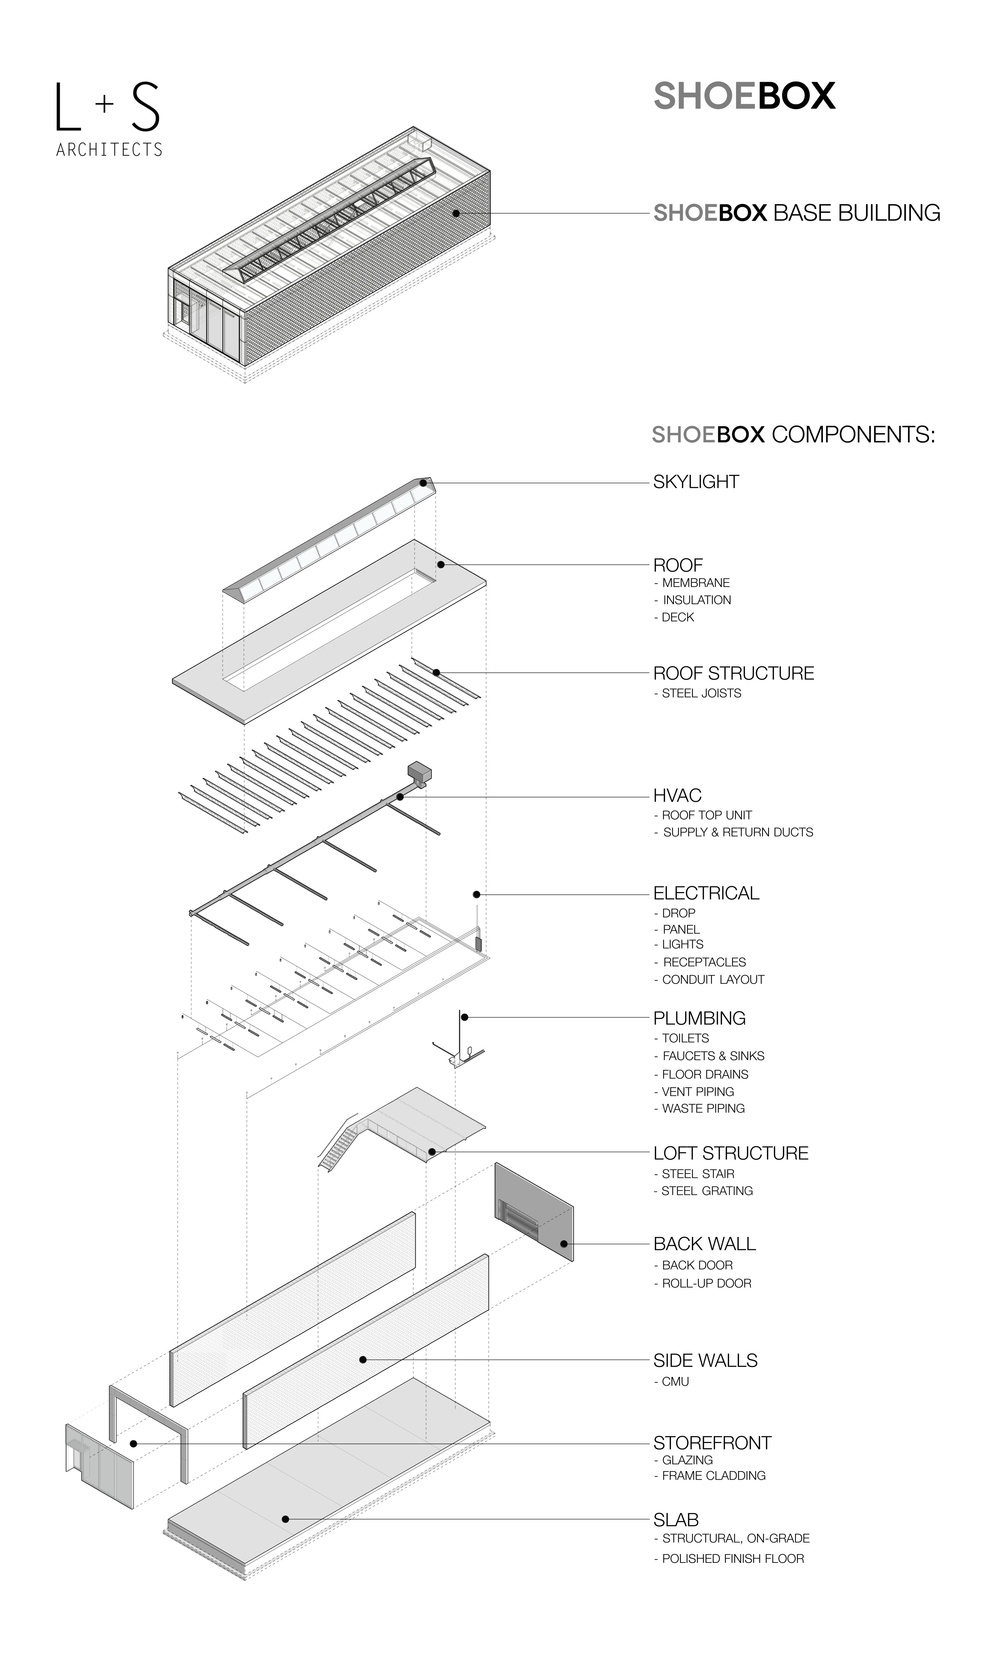 shoebox_diagram.jpeg